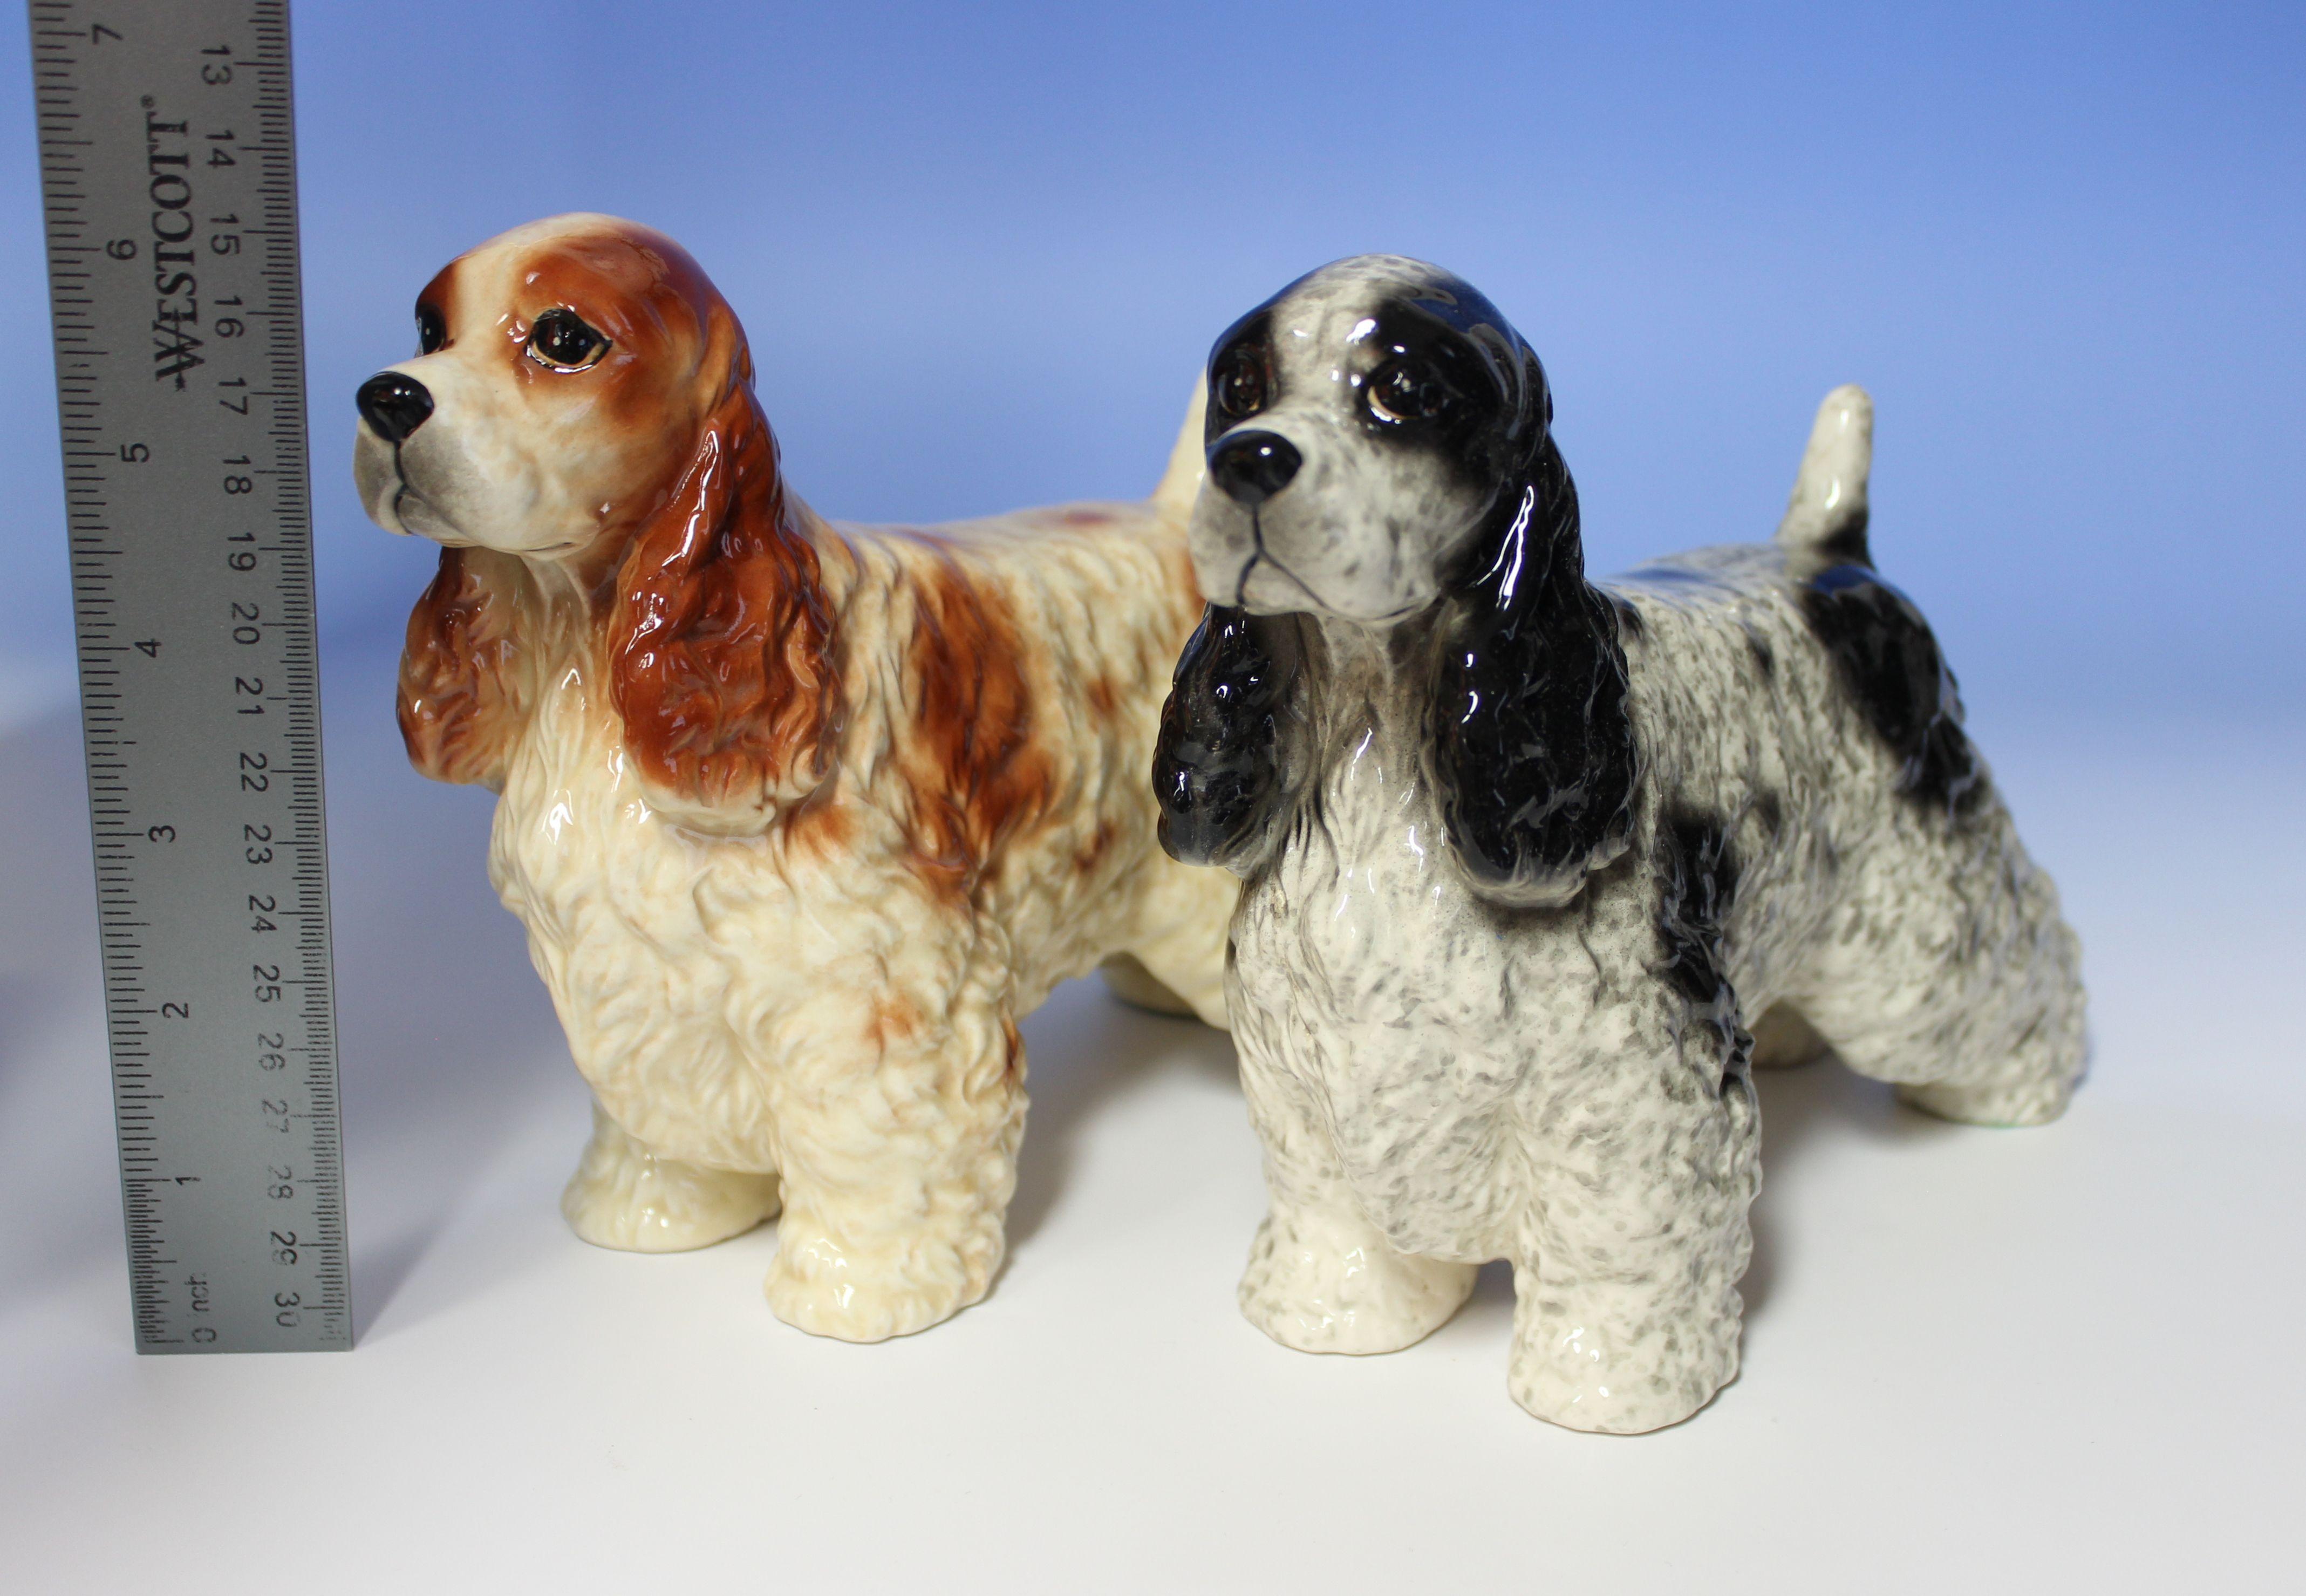 Cocker Spaniel Blue Roan Orange Roan Black White Red White Ticking Speckled Show Dog 8 5 L Porcelain Dog Figuri Porcelain Dog Spaniel Art Dog Sculpture